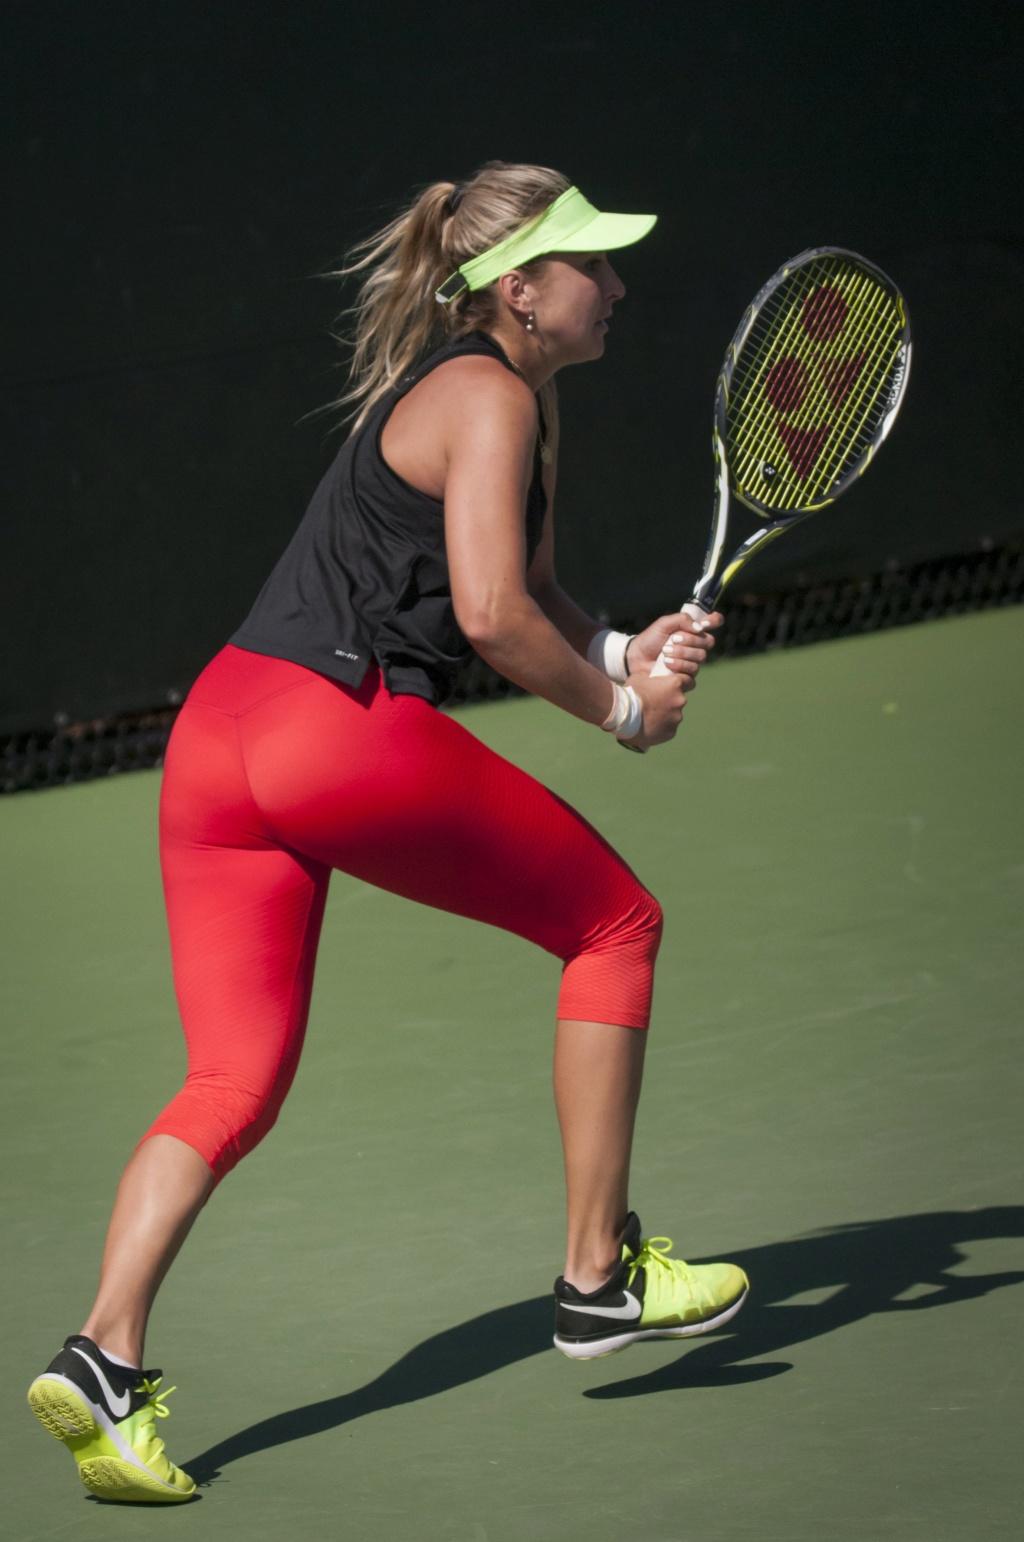 Jeu Prono Tennis US OPEN   - Page 7 Ix8jof10